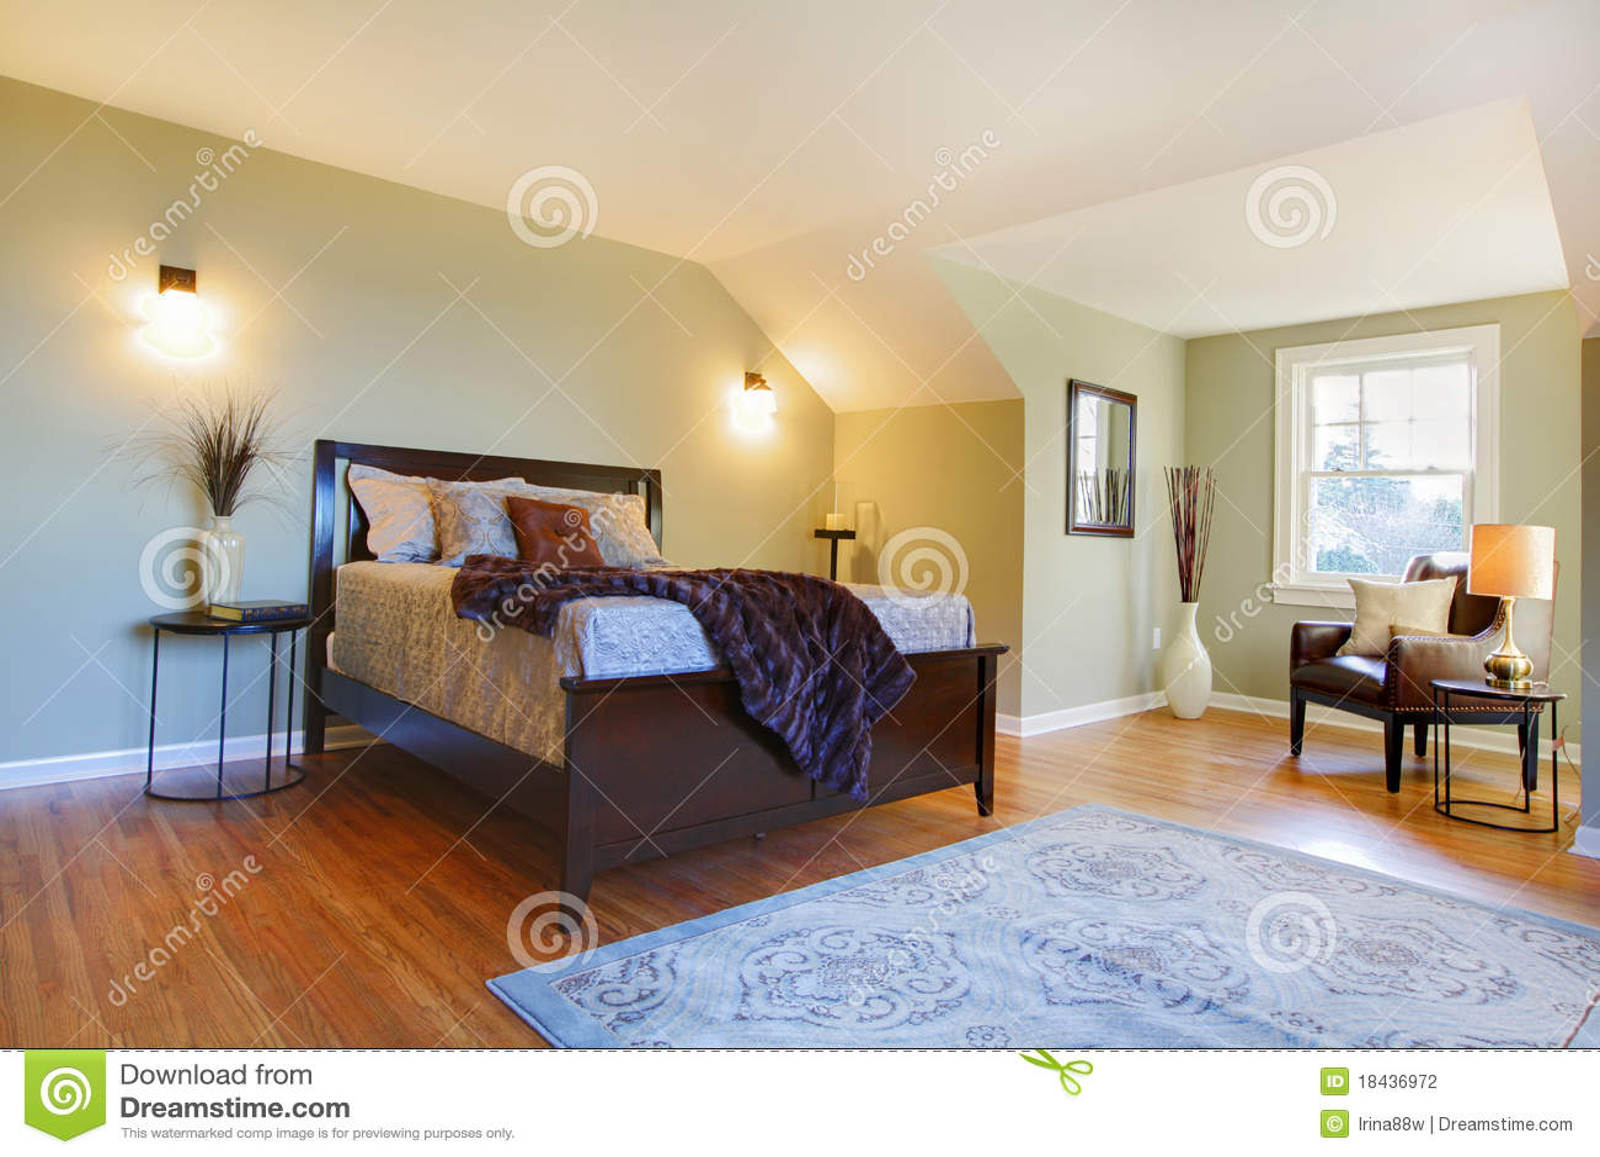 Slaapkamer Groen Bruin : Verse groene slaapkamer met modern bruin bed stock foto